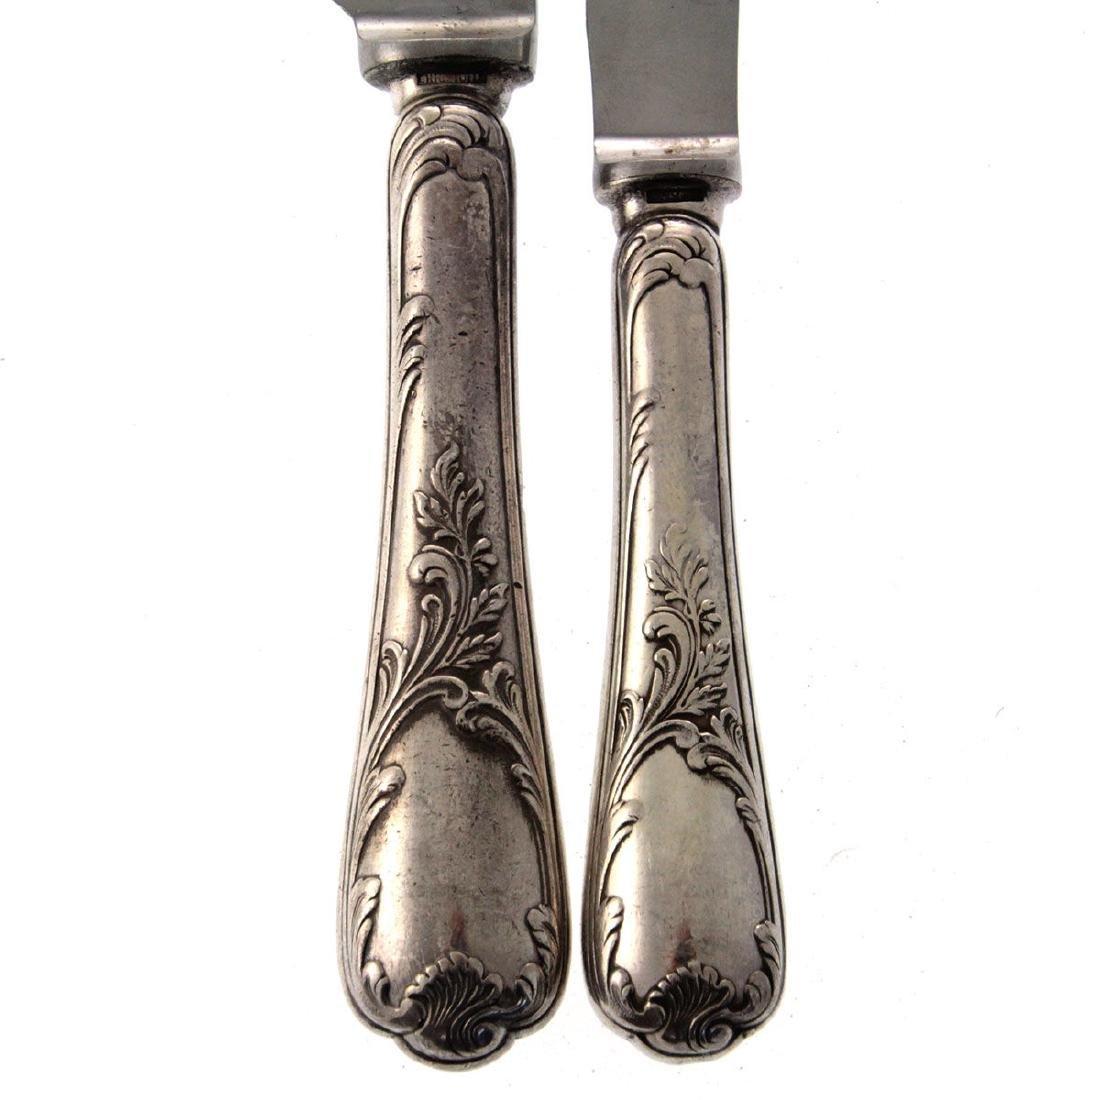 Christofle 65pcs Silver Plated Flatware Cutlery Set, - 4